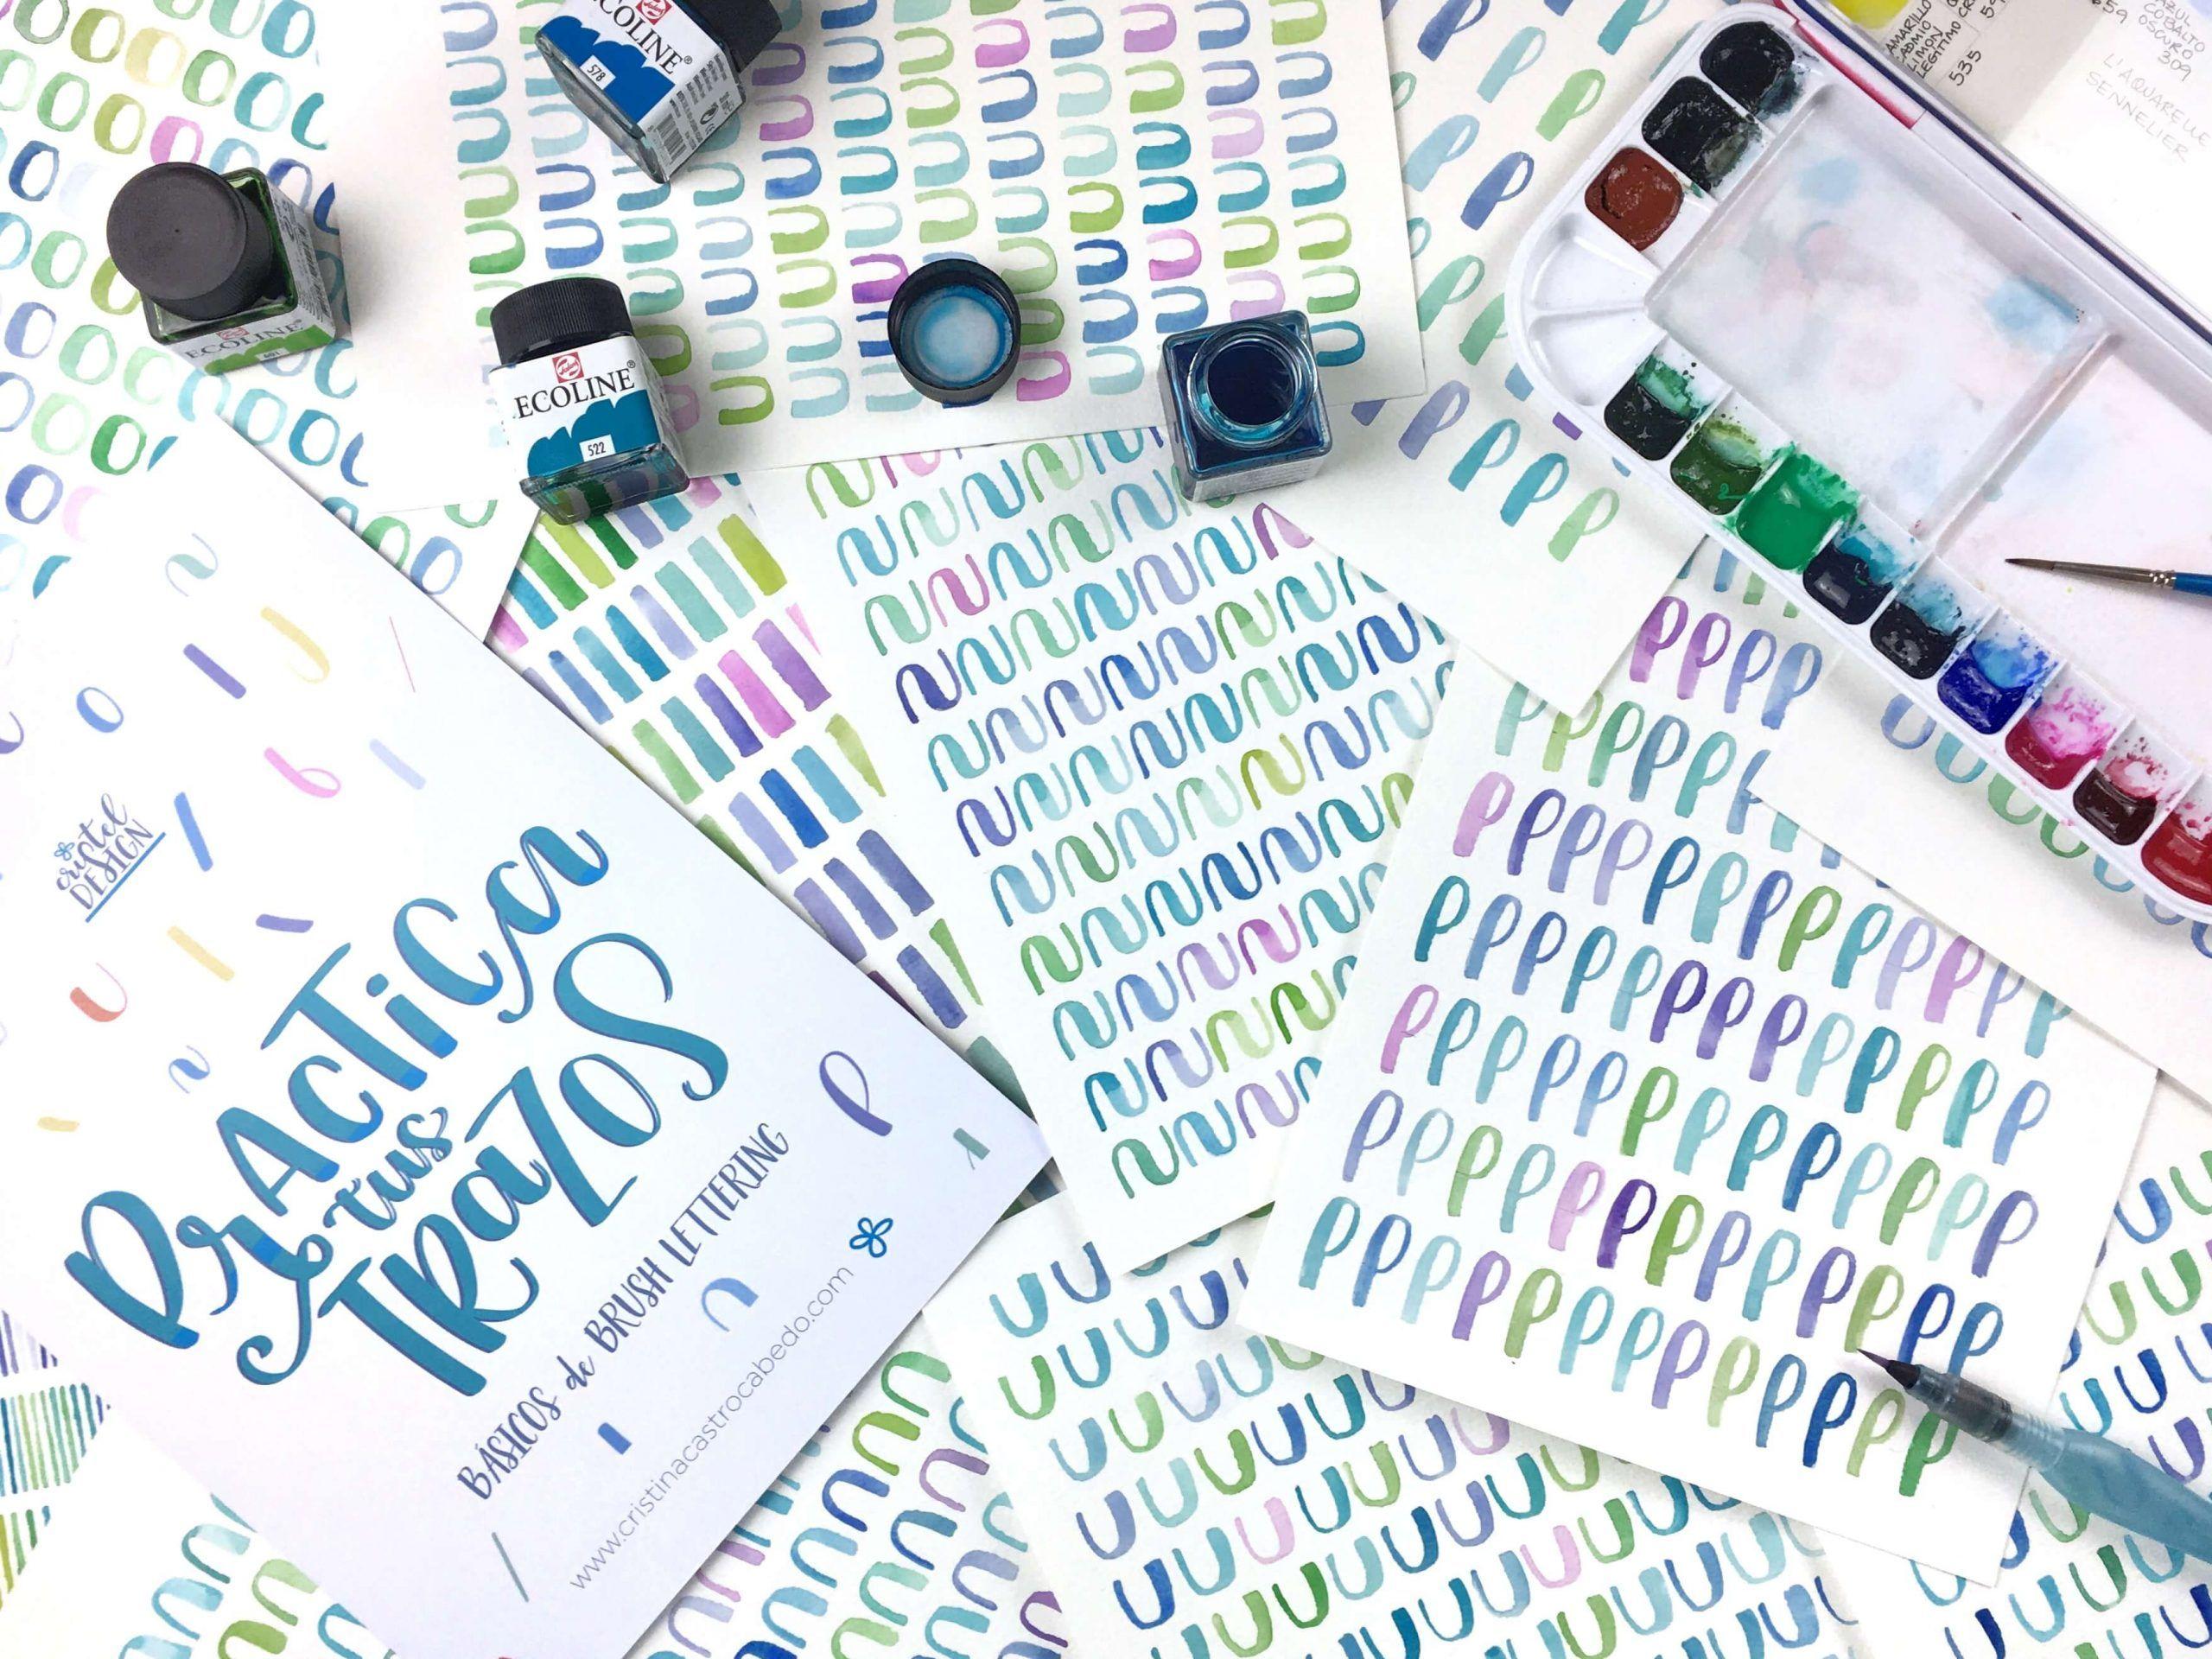 Practica brush lettering con acuarelas